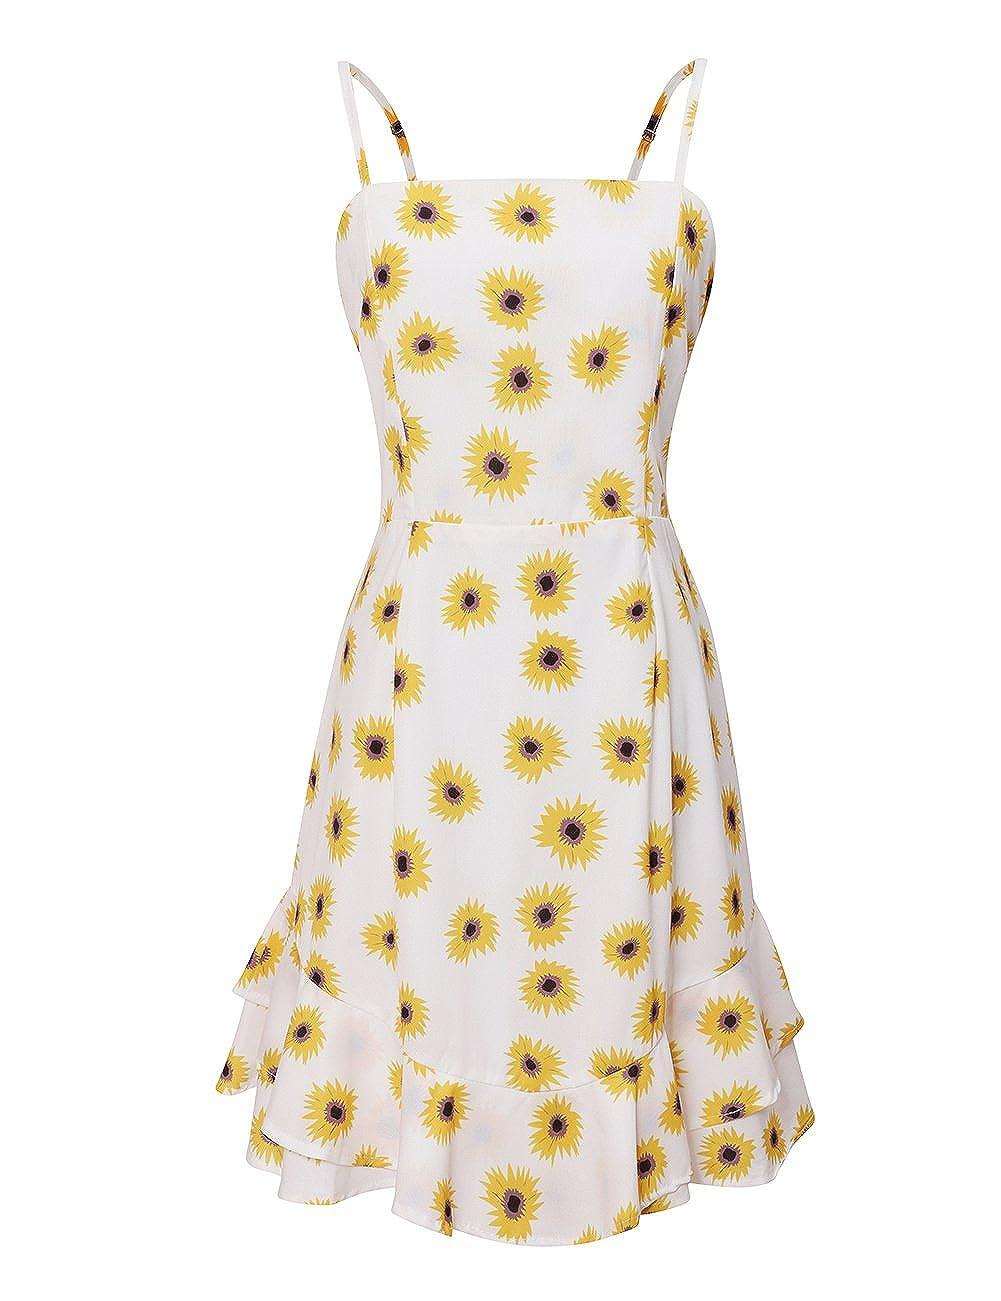 Yellow colorful House Women Backless Bowknot Spaghetti Strap Short Beach Mini Dress